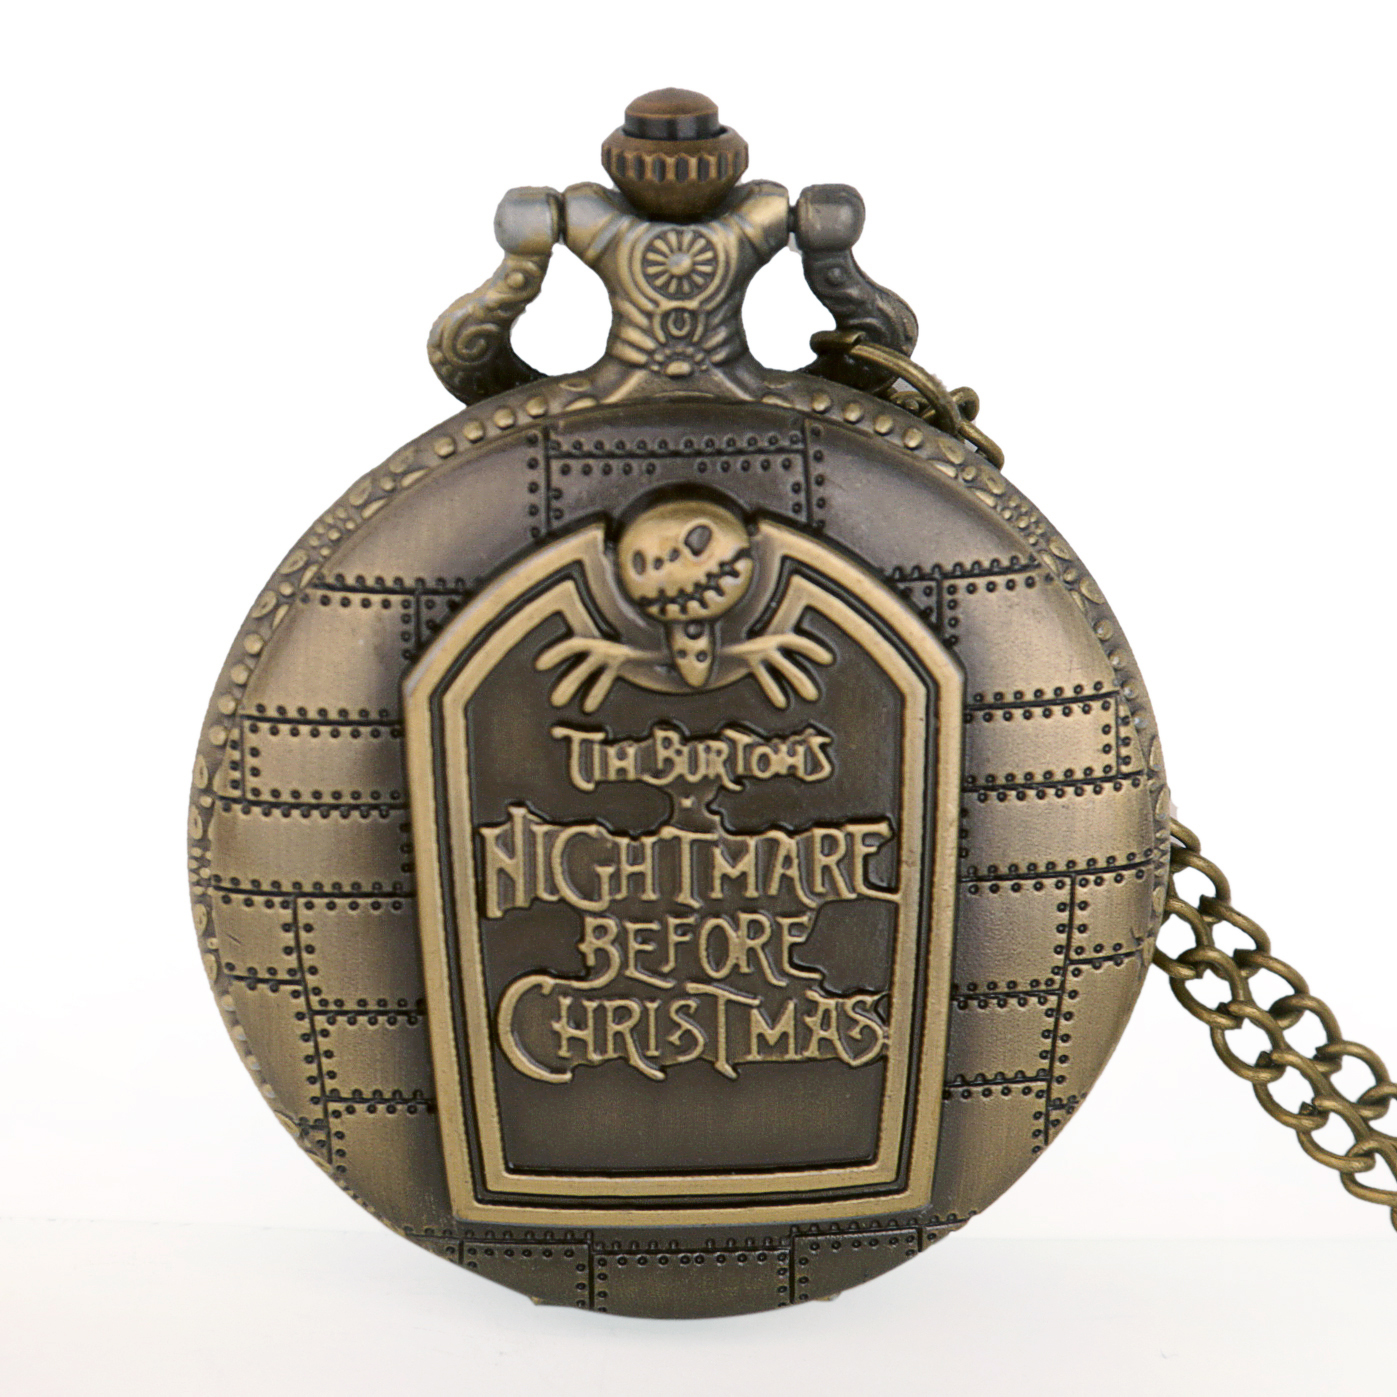 Christmas Quartz Pocket Watch Vintage Roman Numeral Display Pendant Clock Birthday Gifts For Boys Dropshipping TD2051